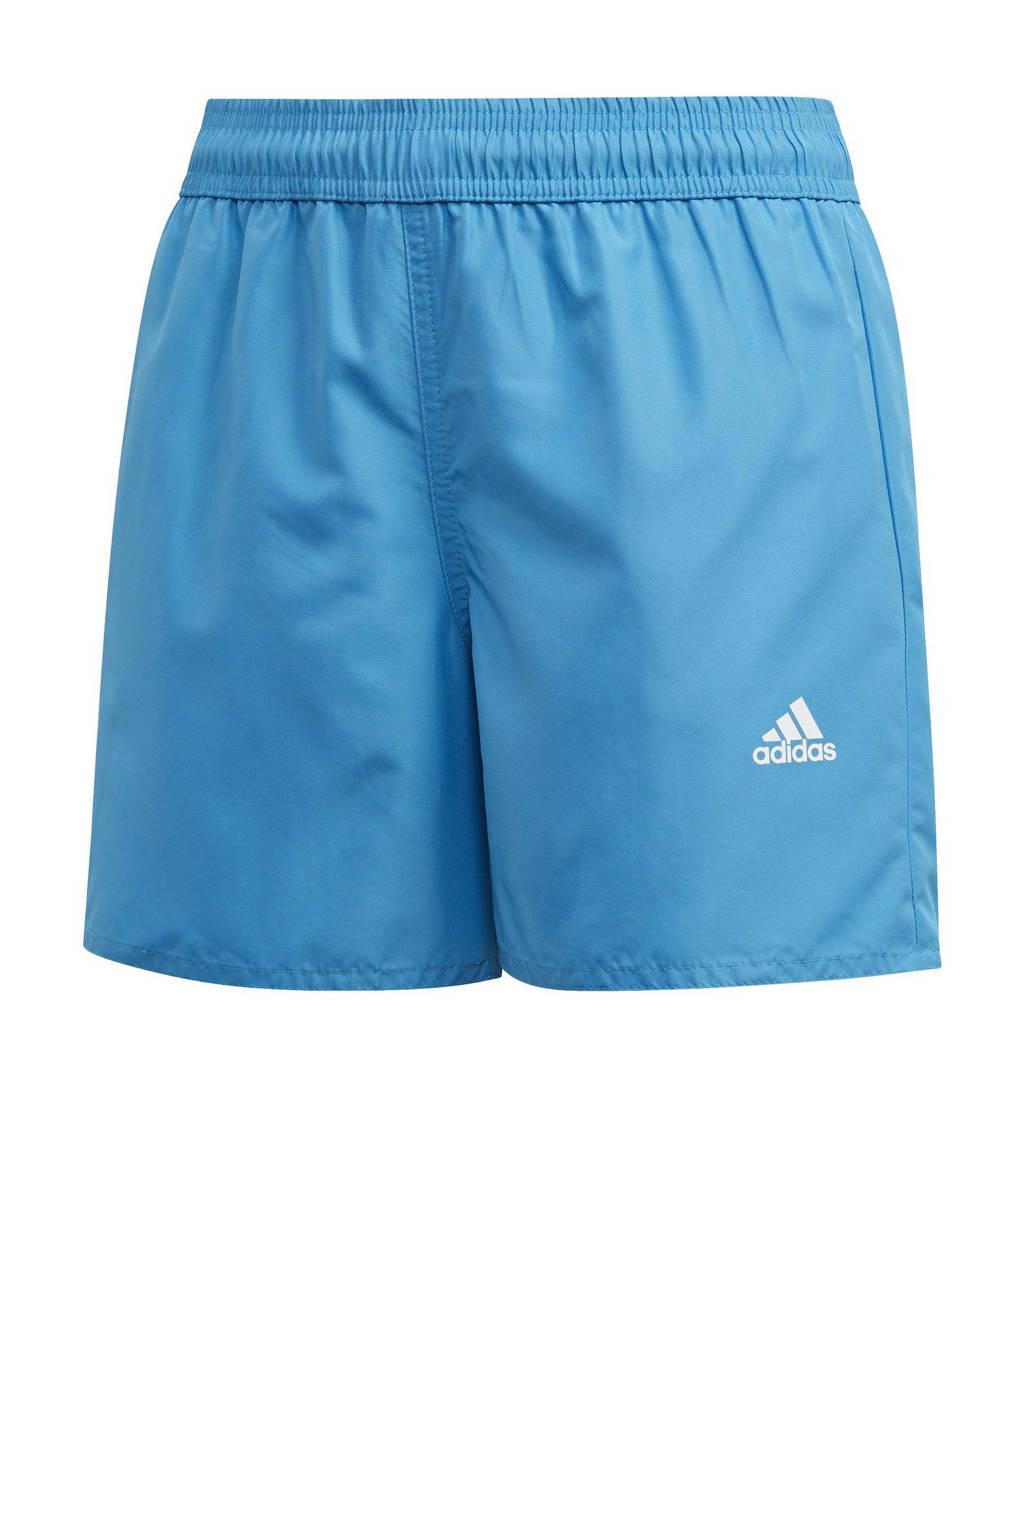 adidas Performance zwemshort Bos blauw, Blauw / Wit